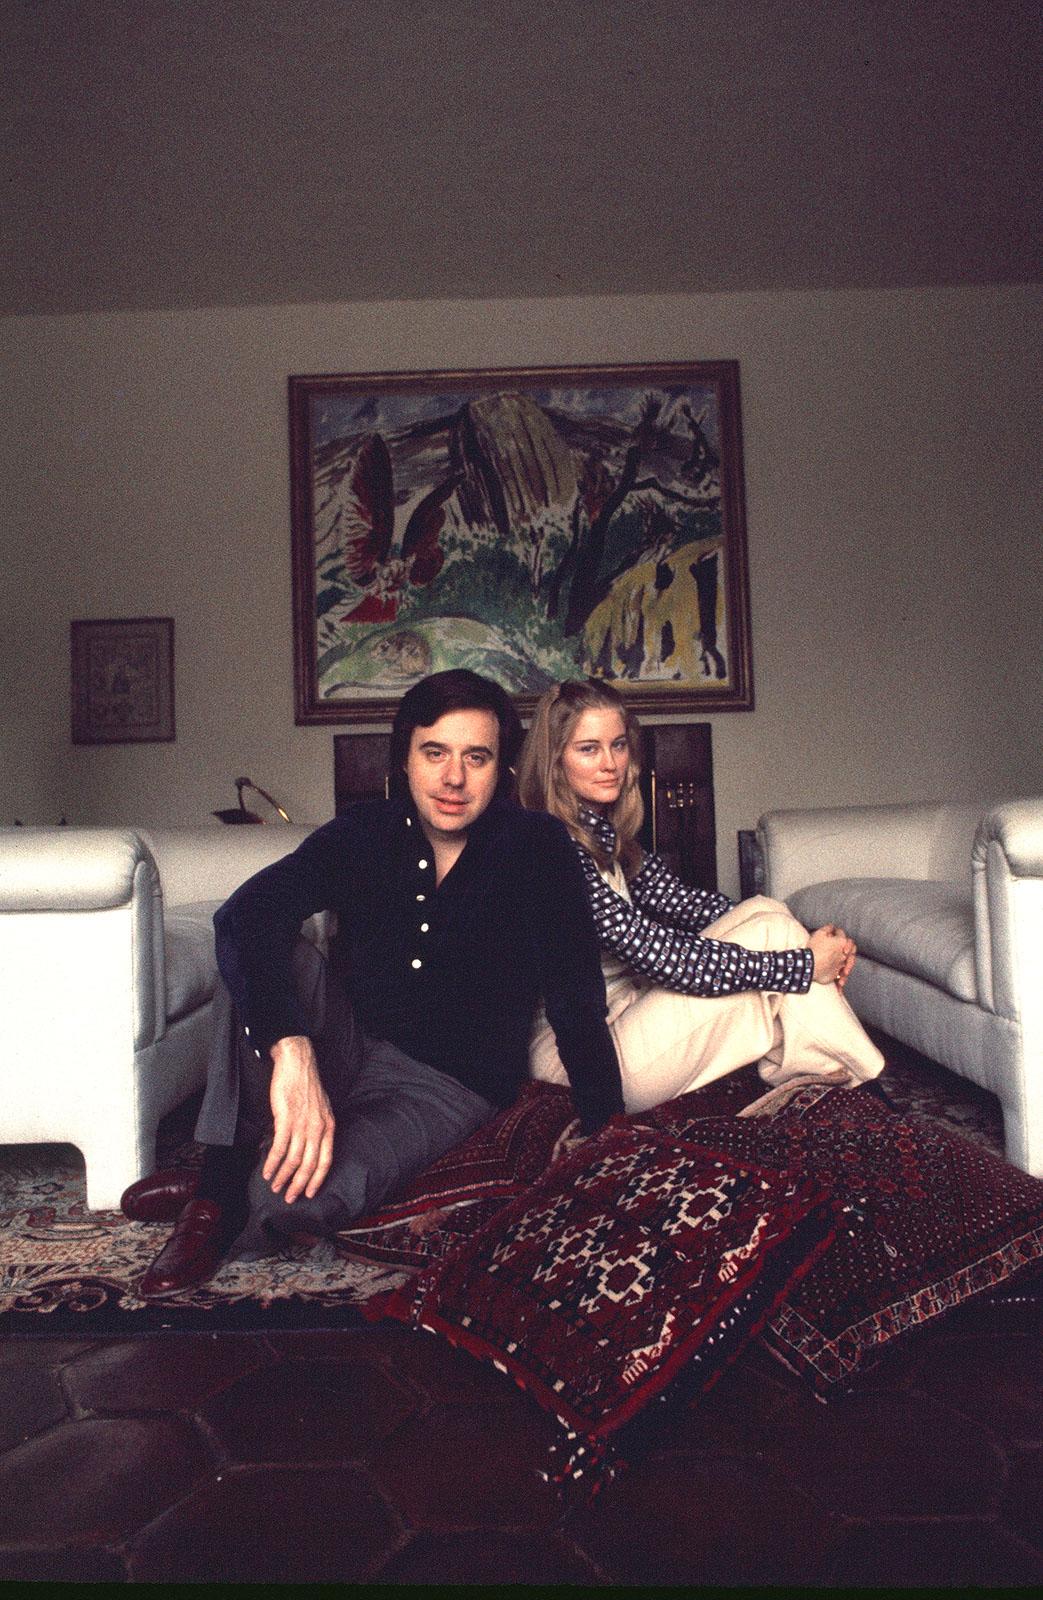 Peter Bogdonavich and Cybil Shepherd